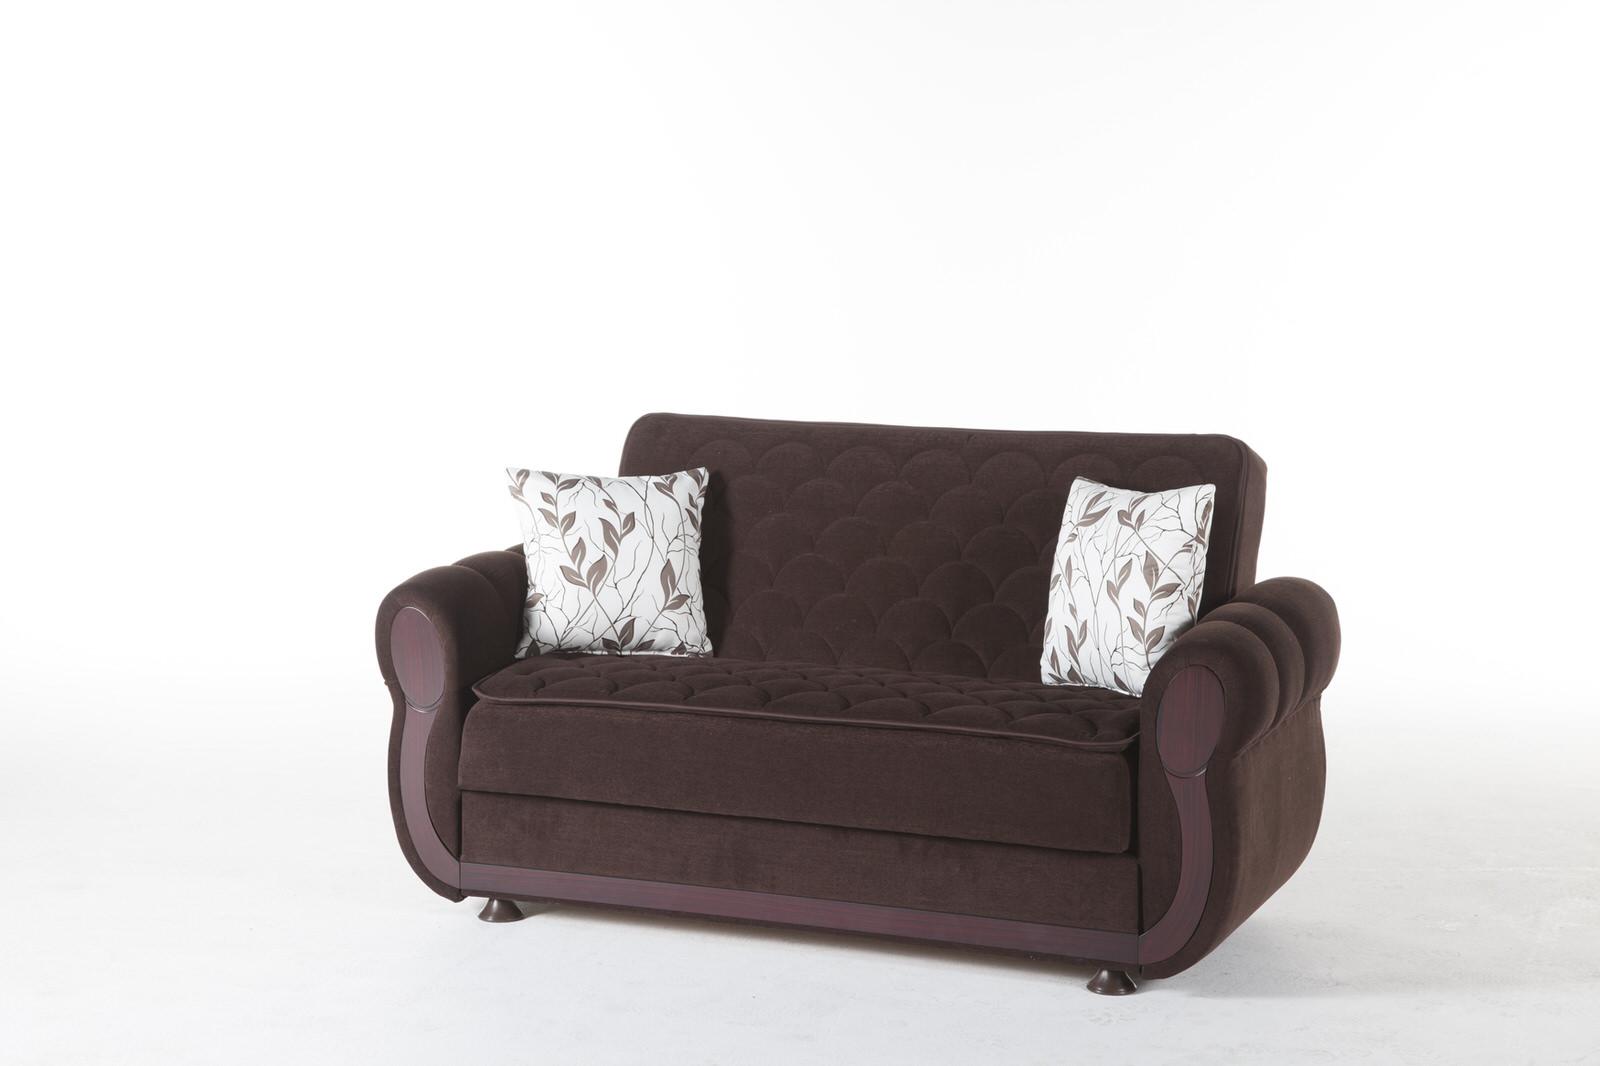 - Argos Colins Brown Loveseat By Istikbal Furniture